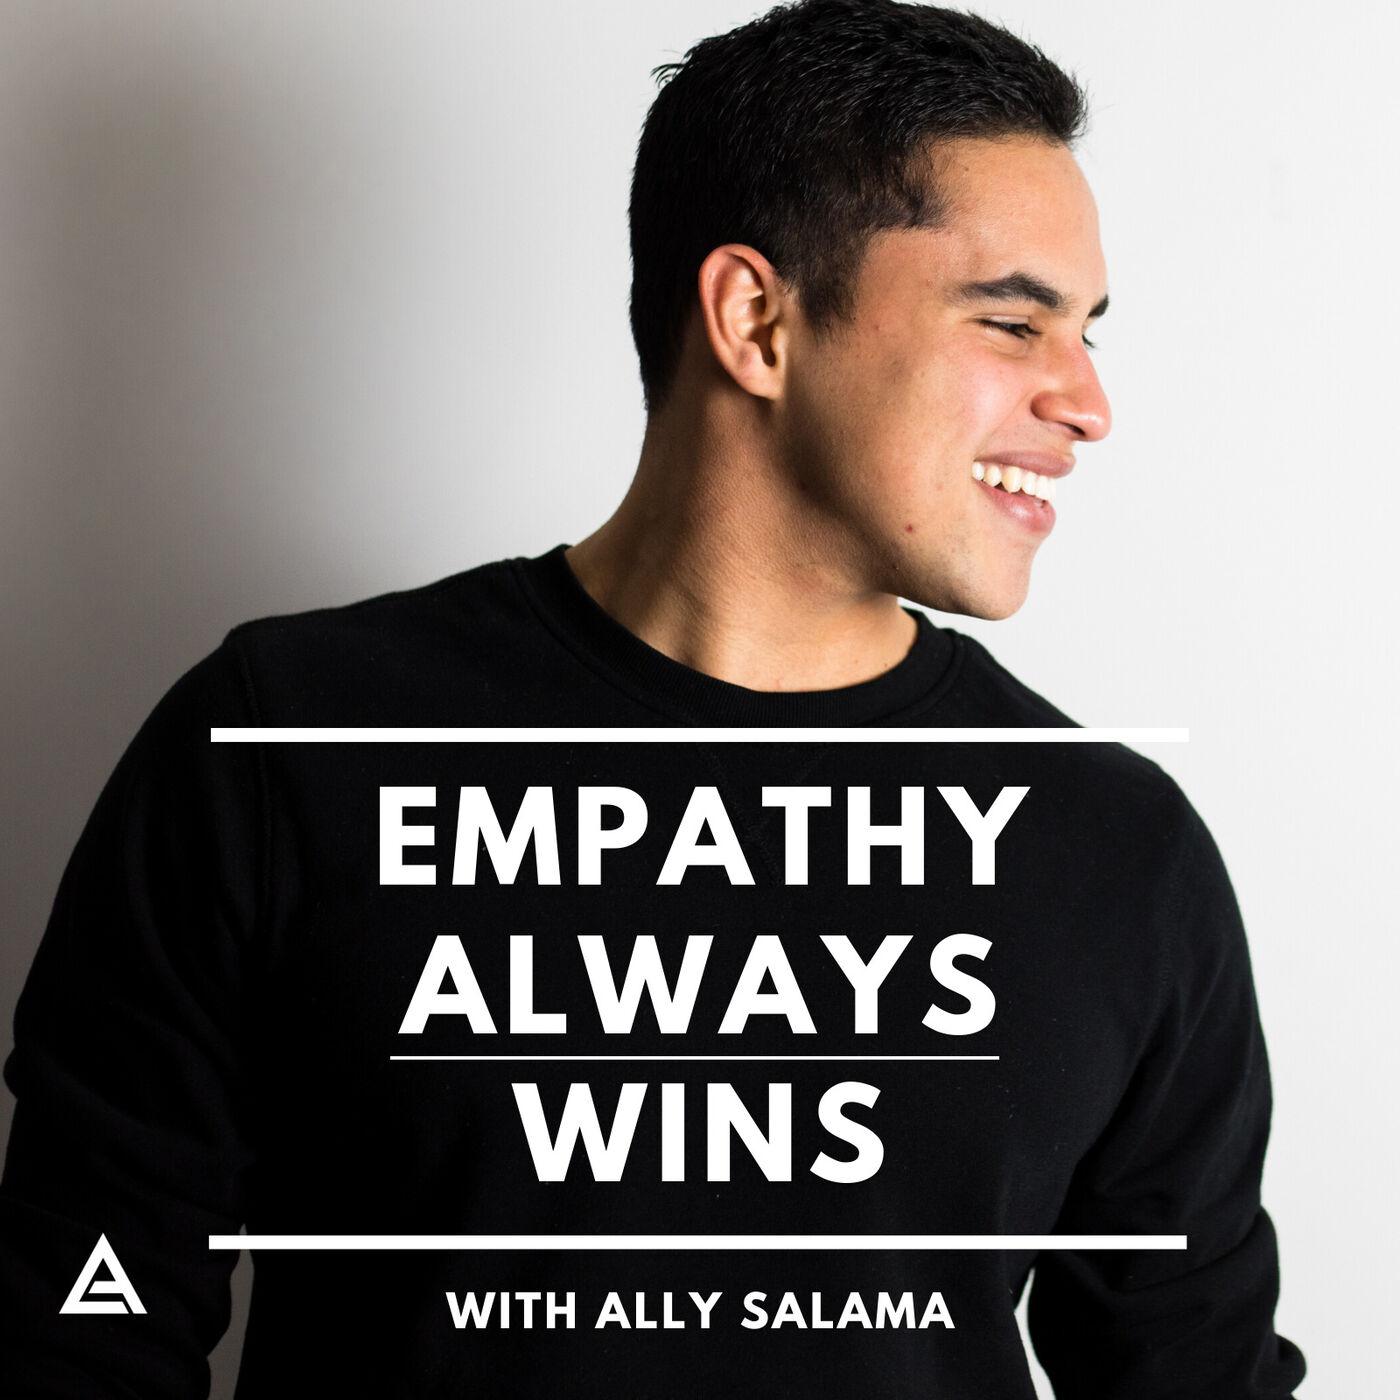 Empathy Always Wins with Ally Salama